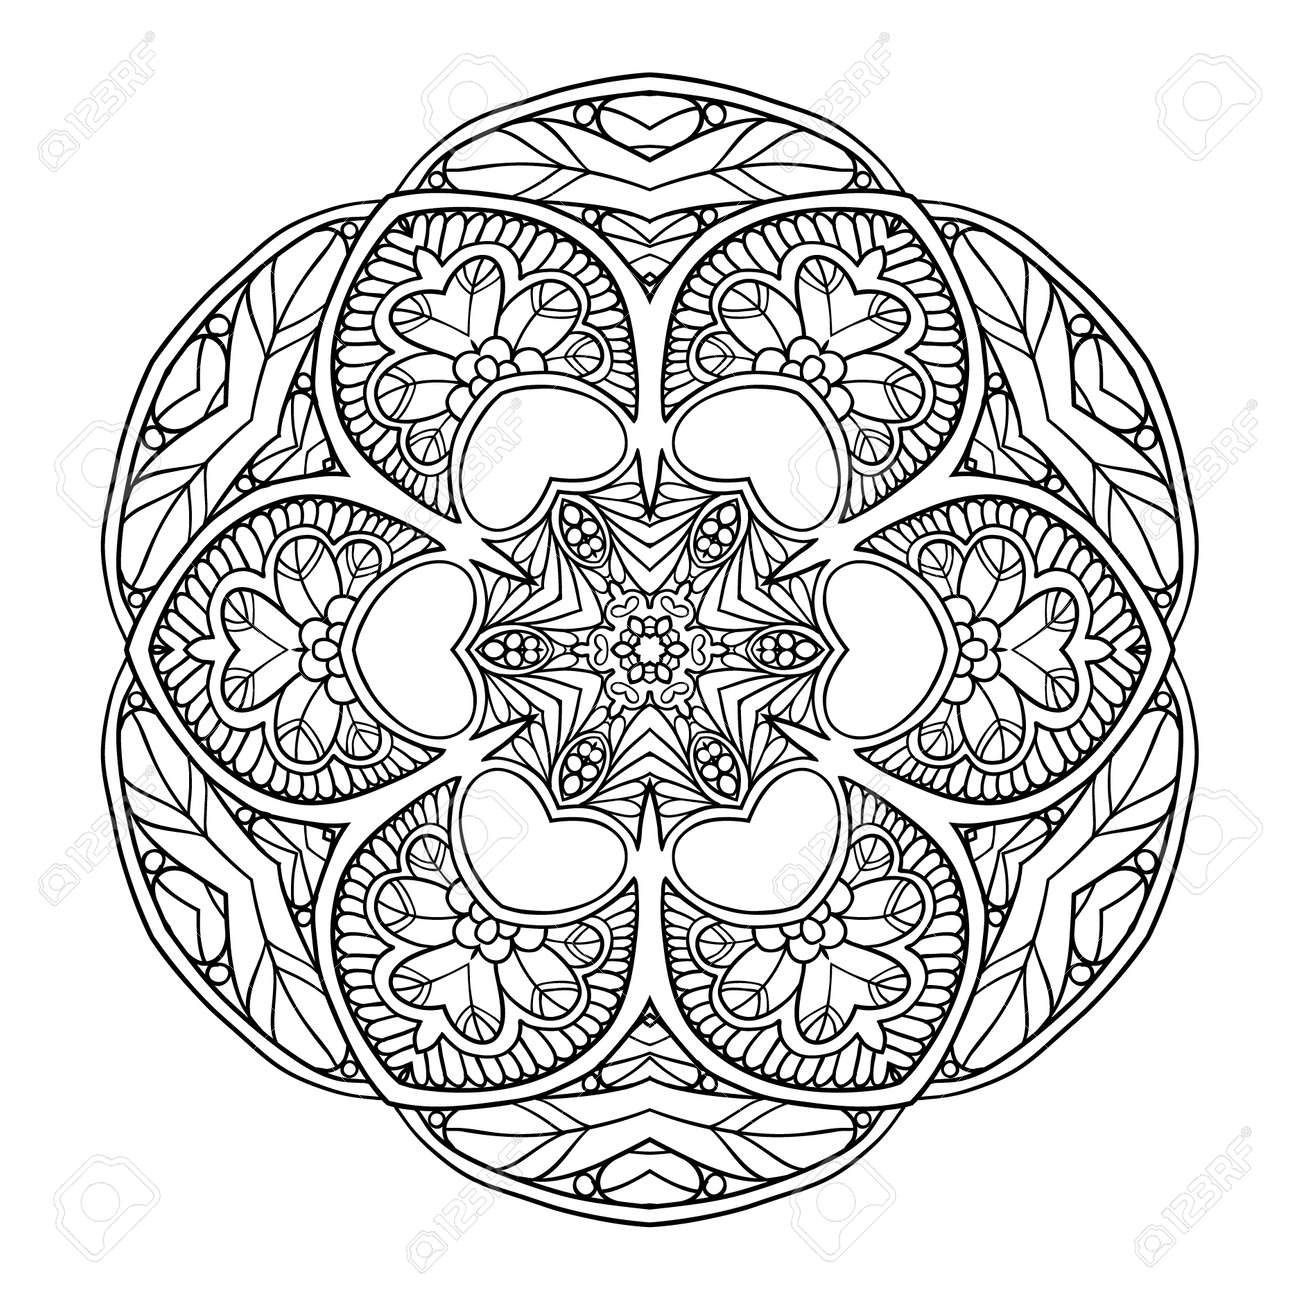 Decorative Mandala Vector Illustration Good For Coloring Book Adult And Older Children